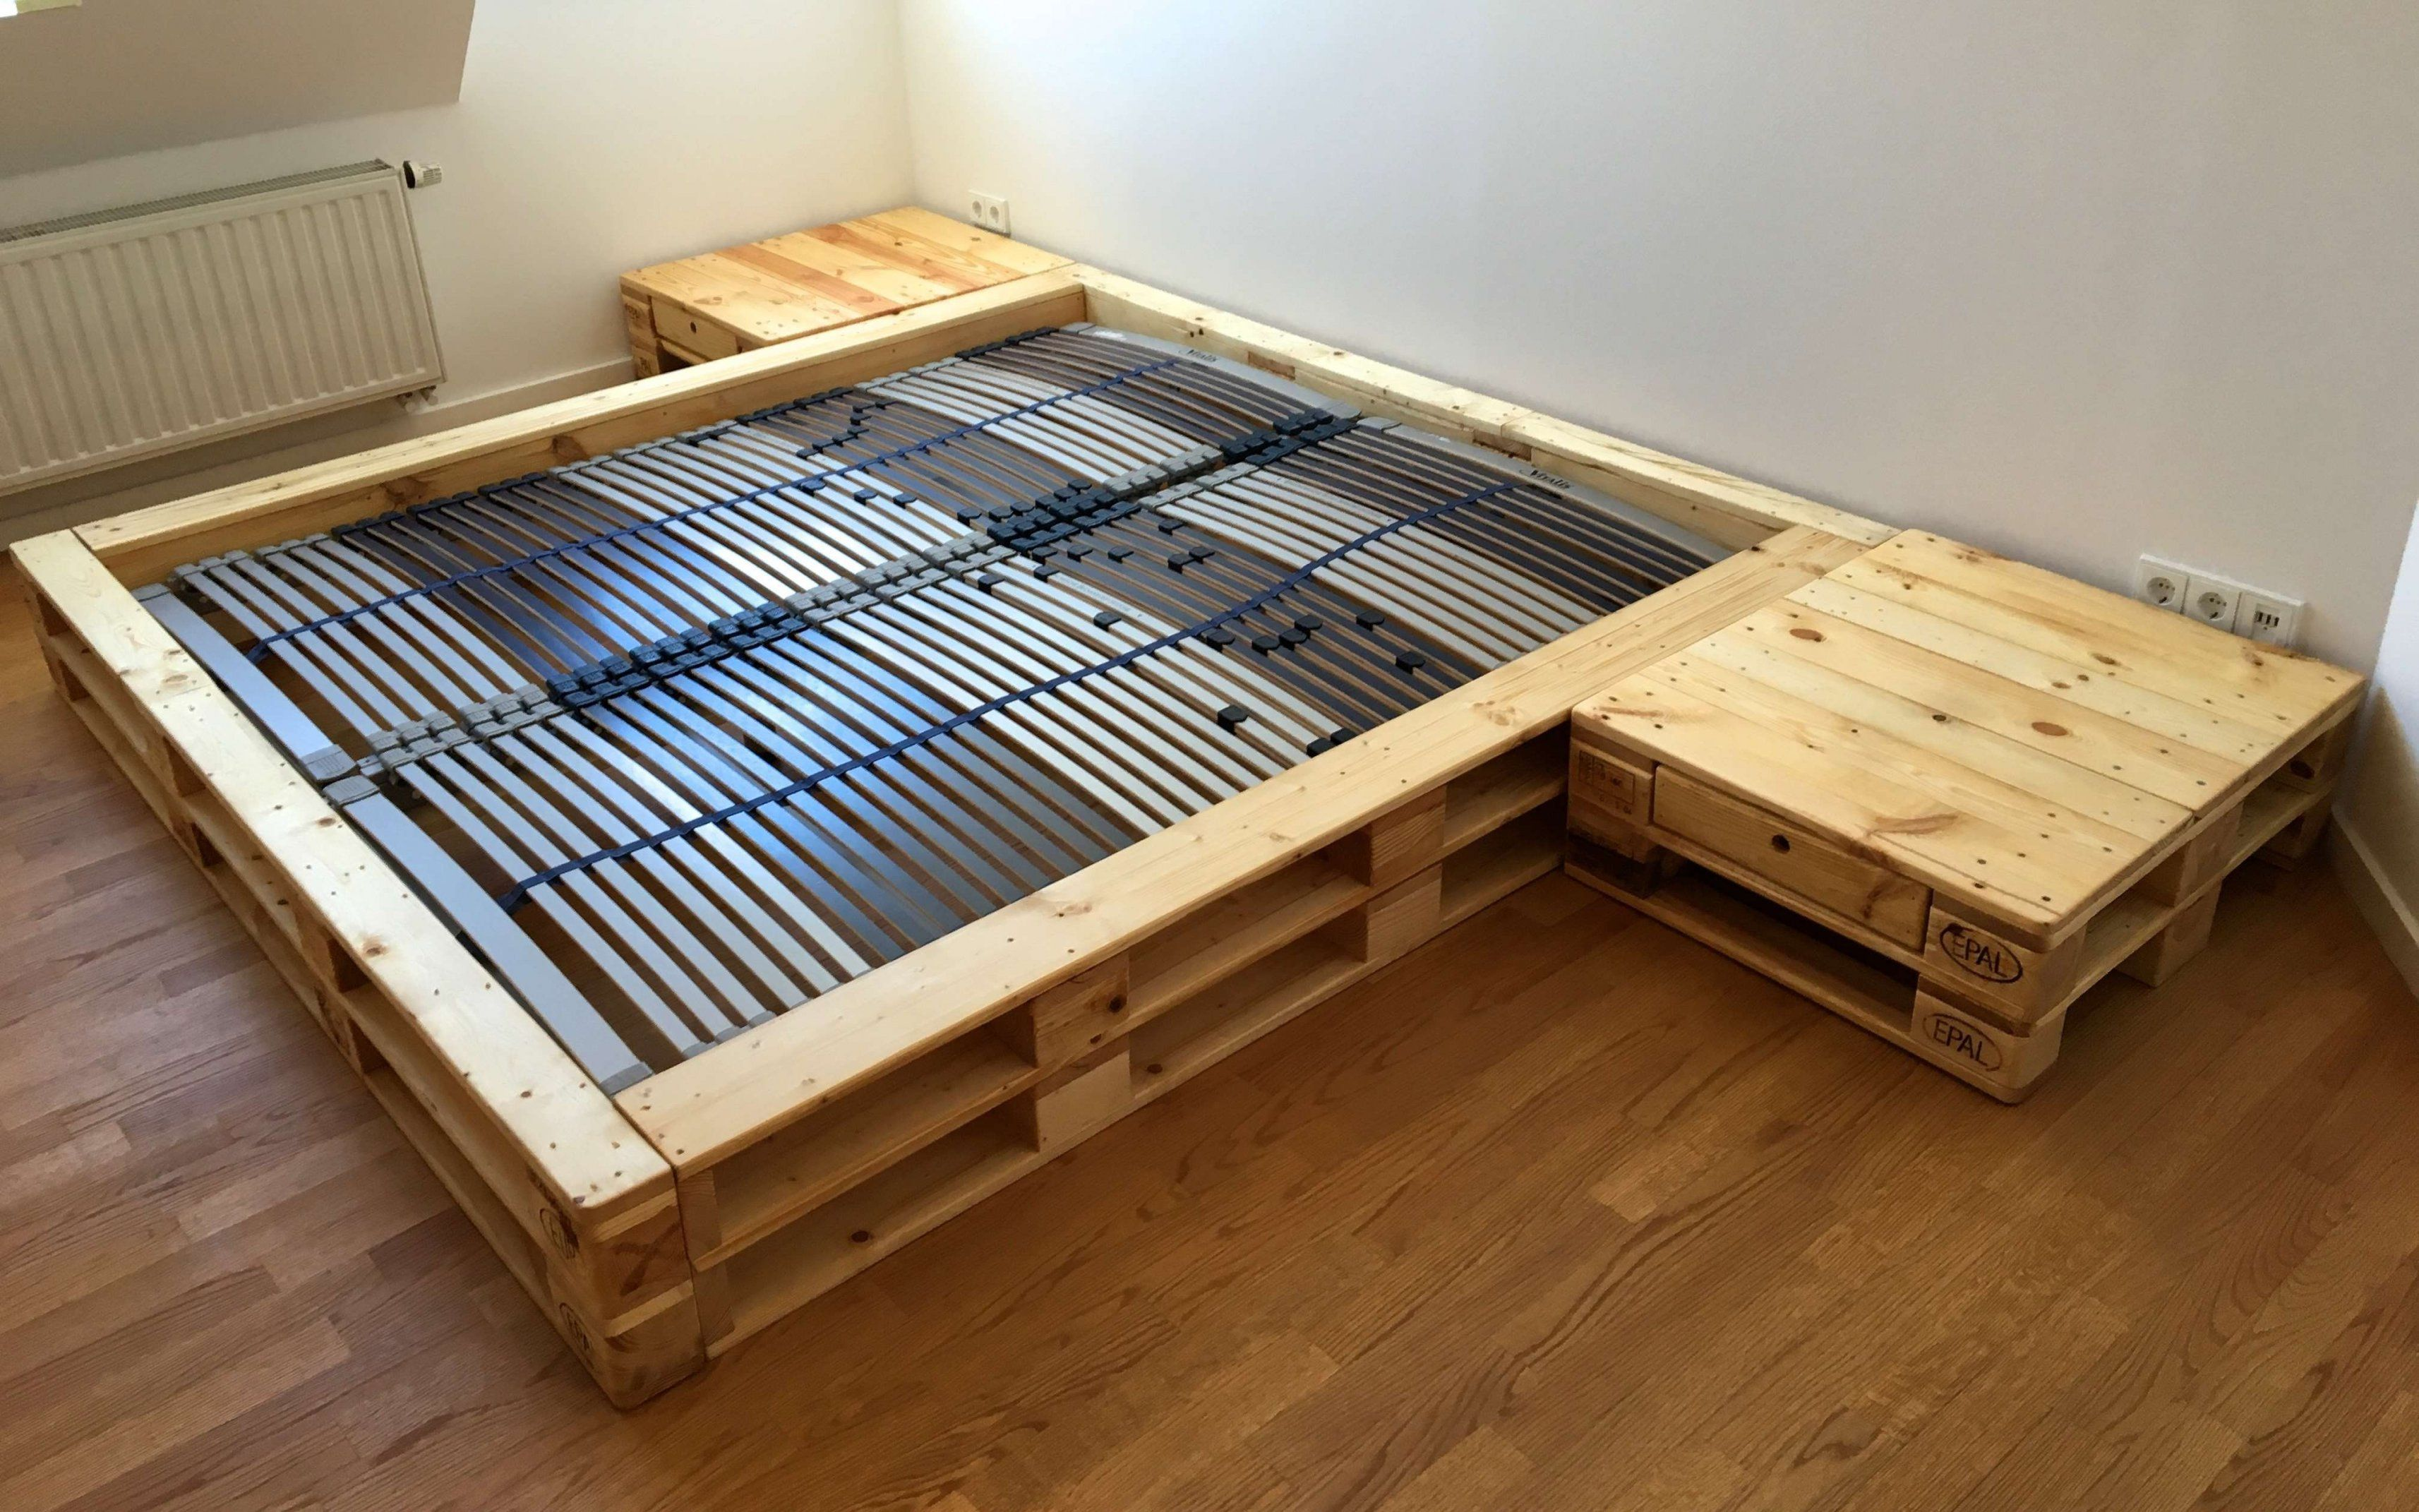 Boxspringbett 140x200 Neu In 2020 Palettenbett Bettrahmen Aus Holzpaletten Bett Mit Lattenrost